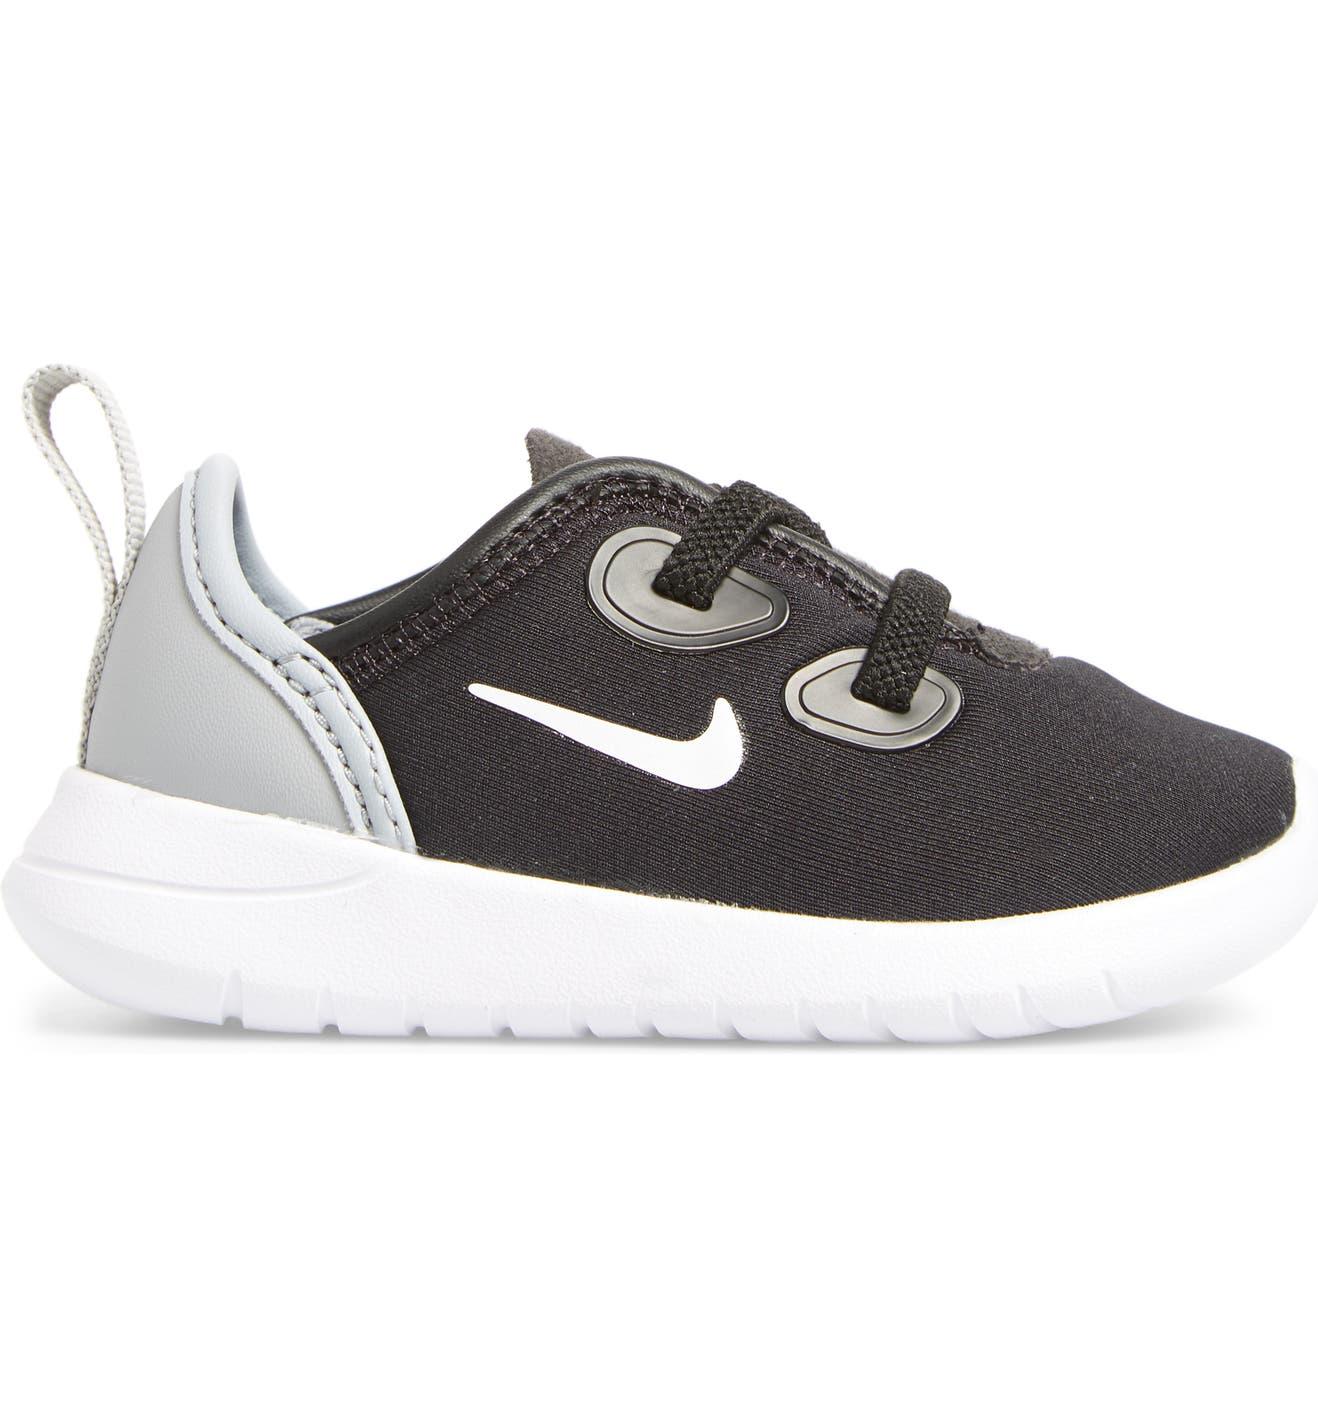 b3ce77b602 Nike Hakata Sneaker (Baby, Walker, Toddler, Little Kid & Big Kid) |  Nordstrom